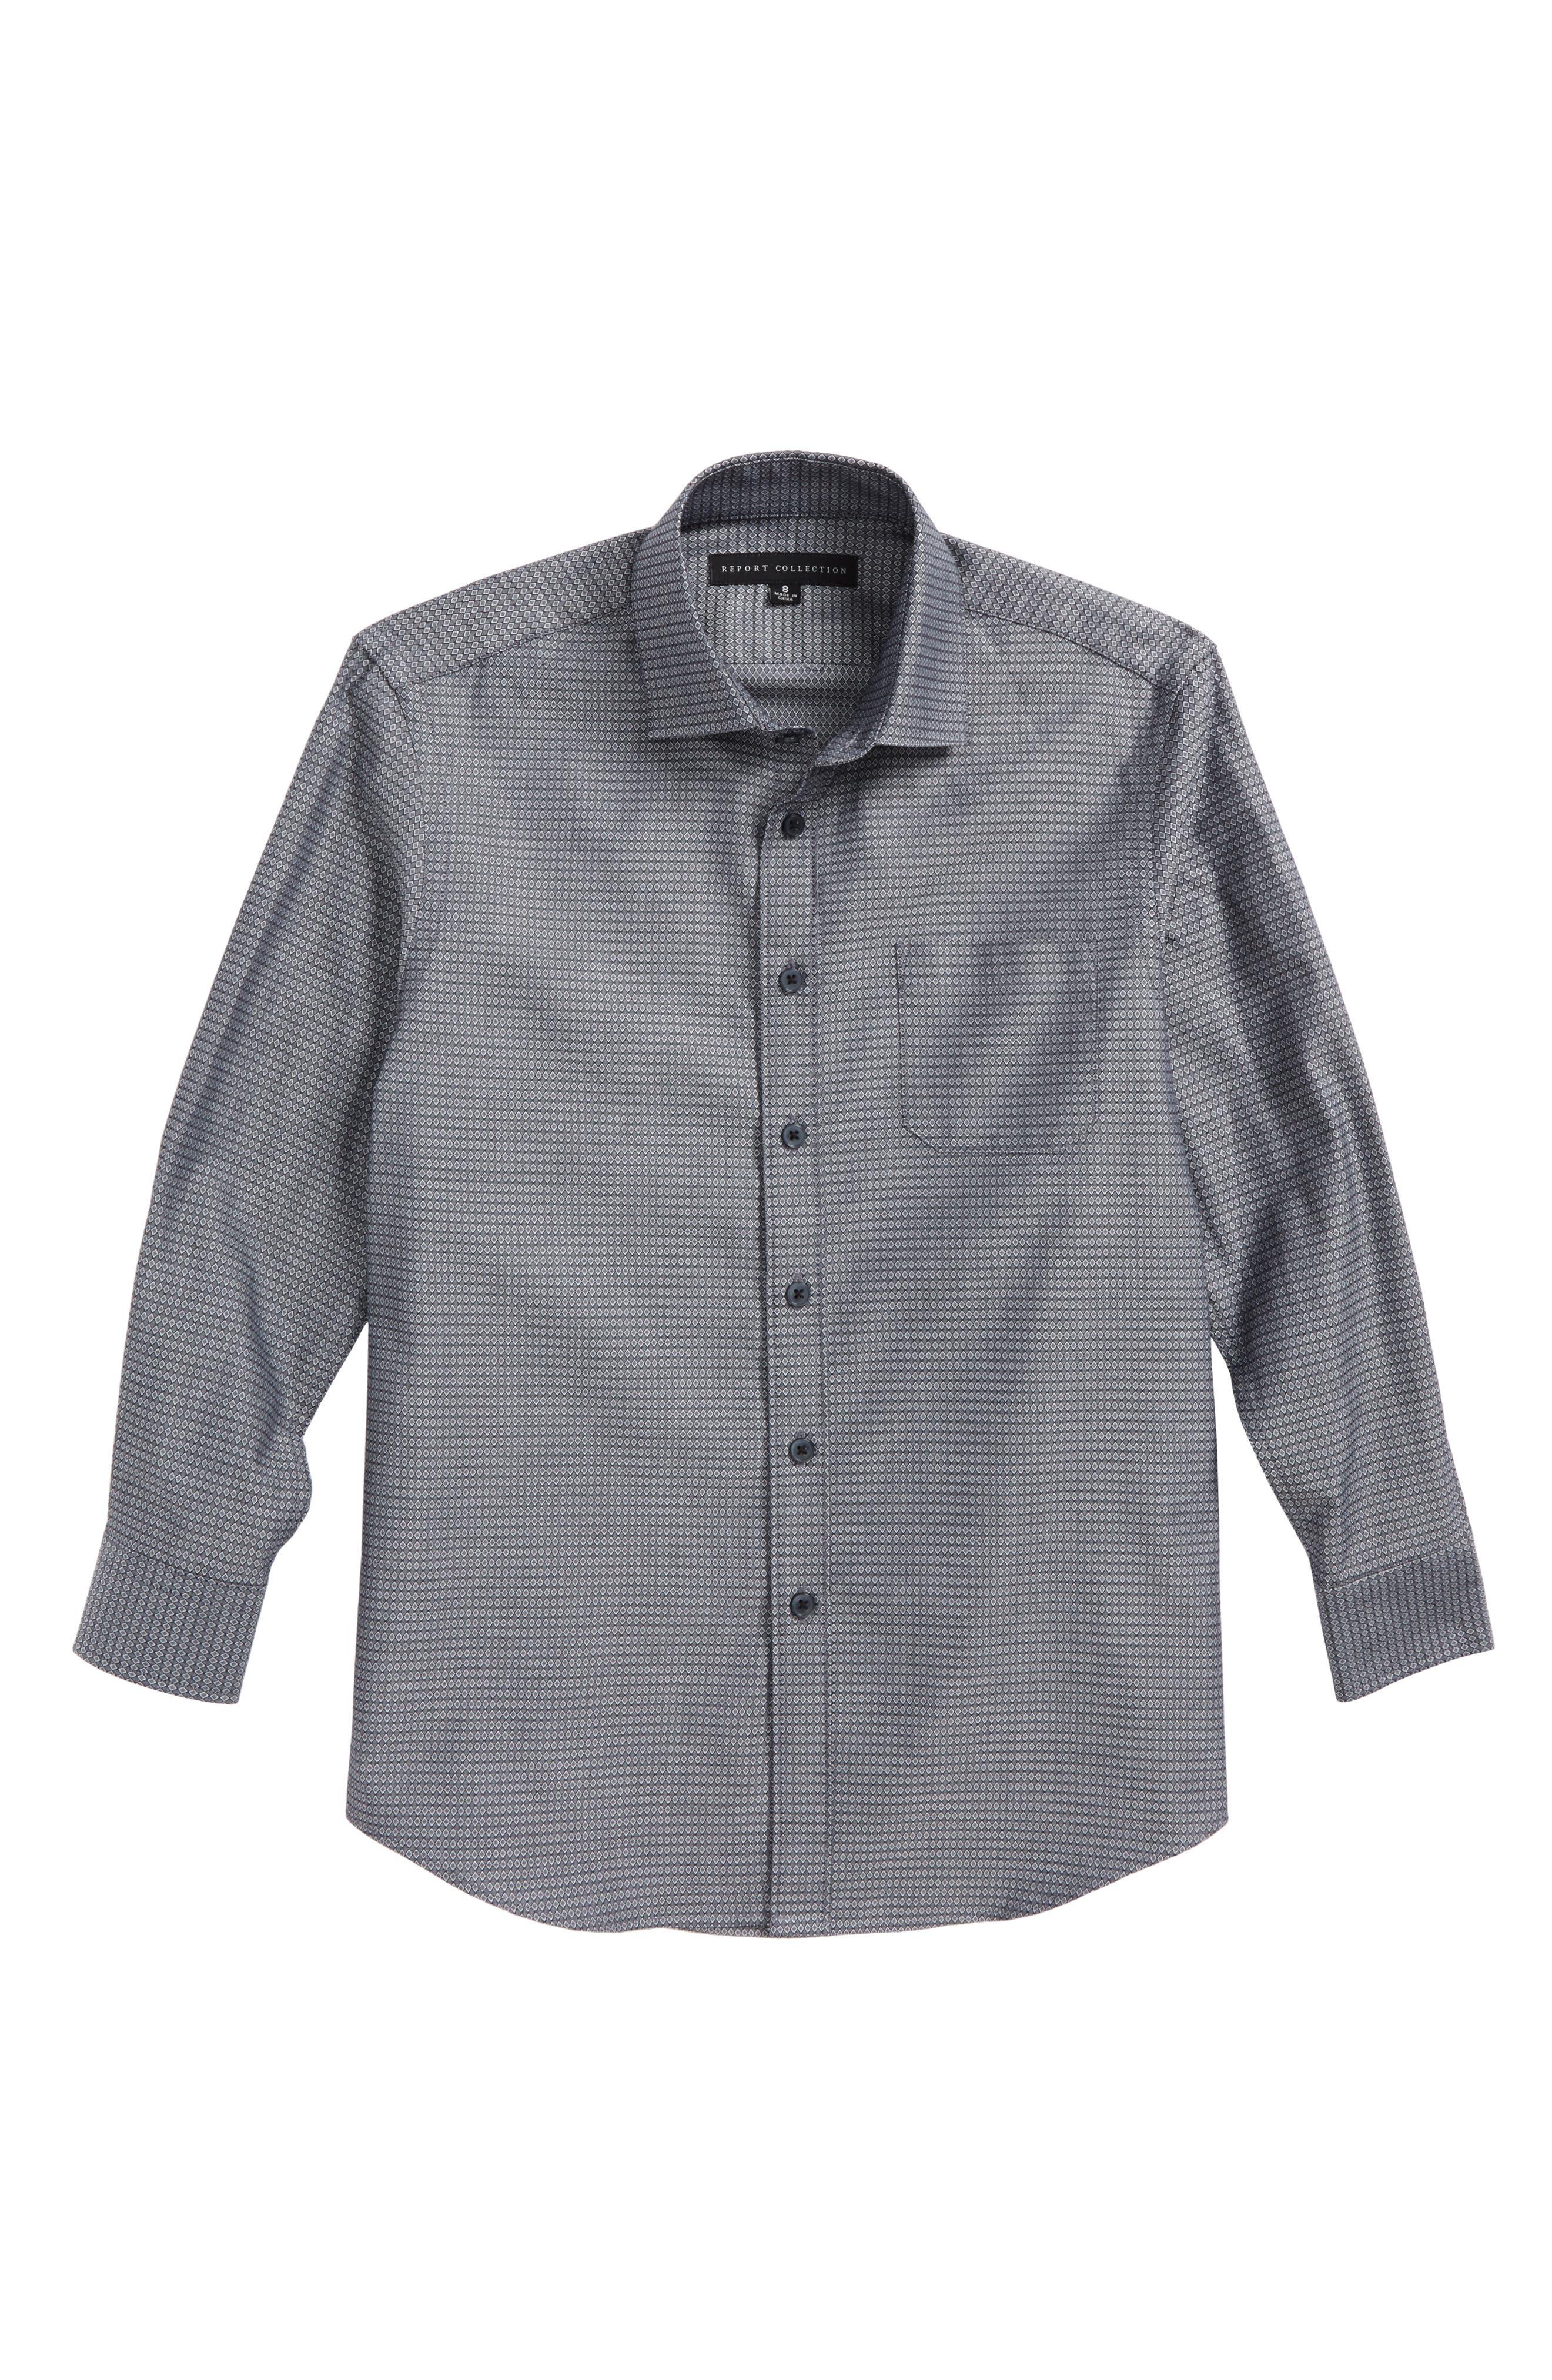 Alternate Image 1 Selected - Report Collection Diamond Grid Dress Shirt (Big Boys)